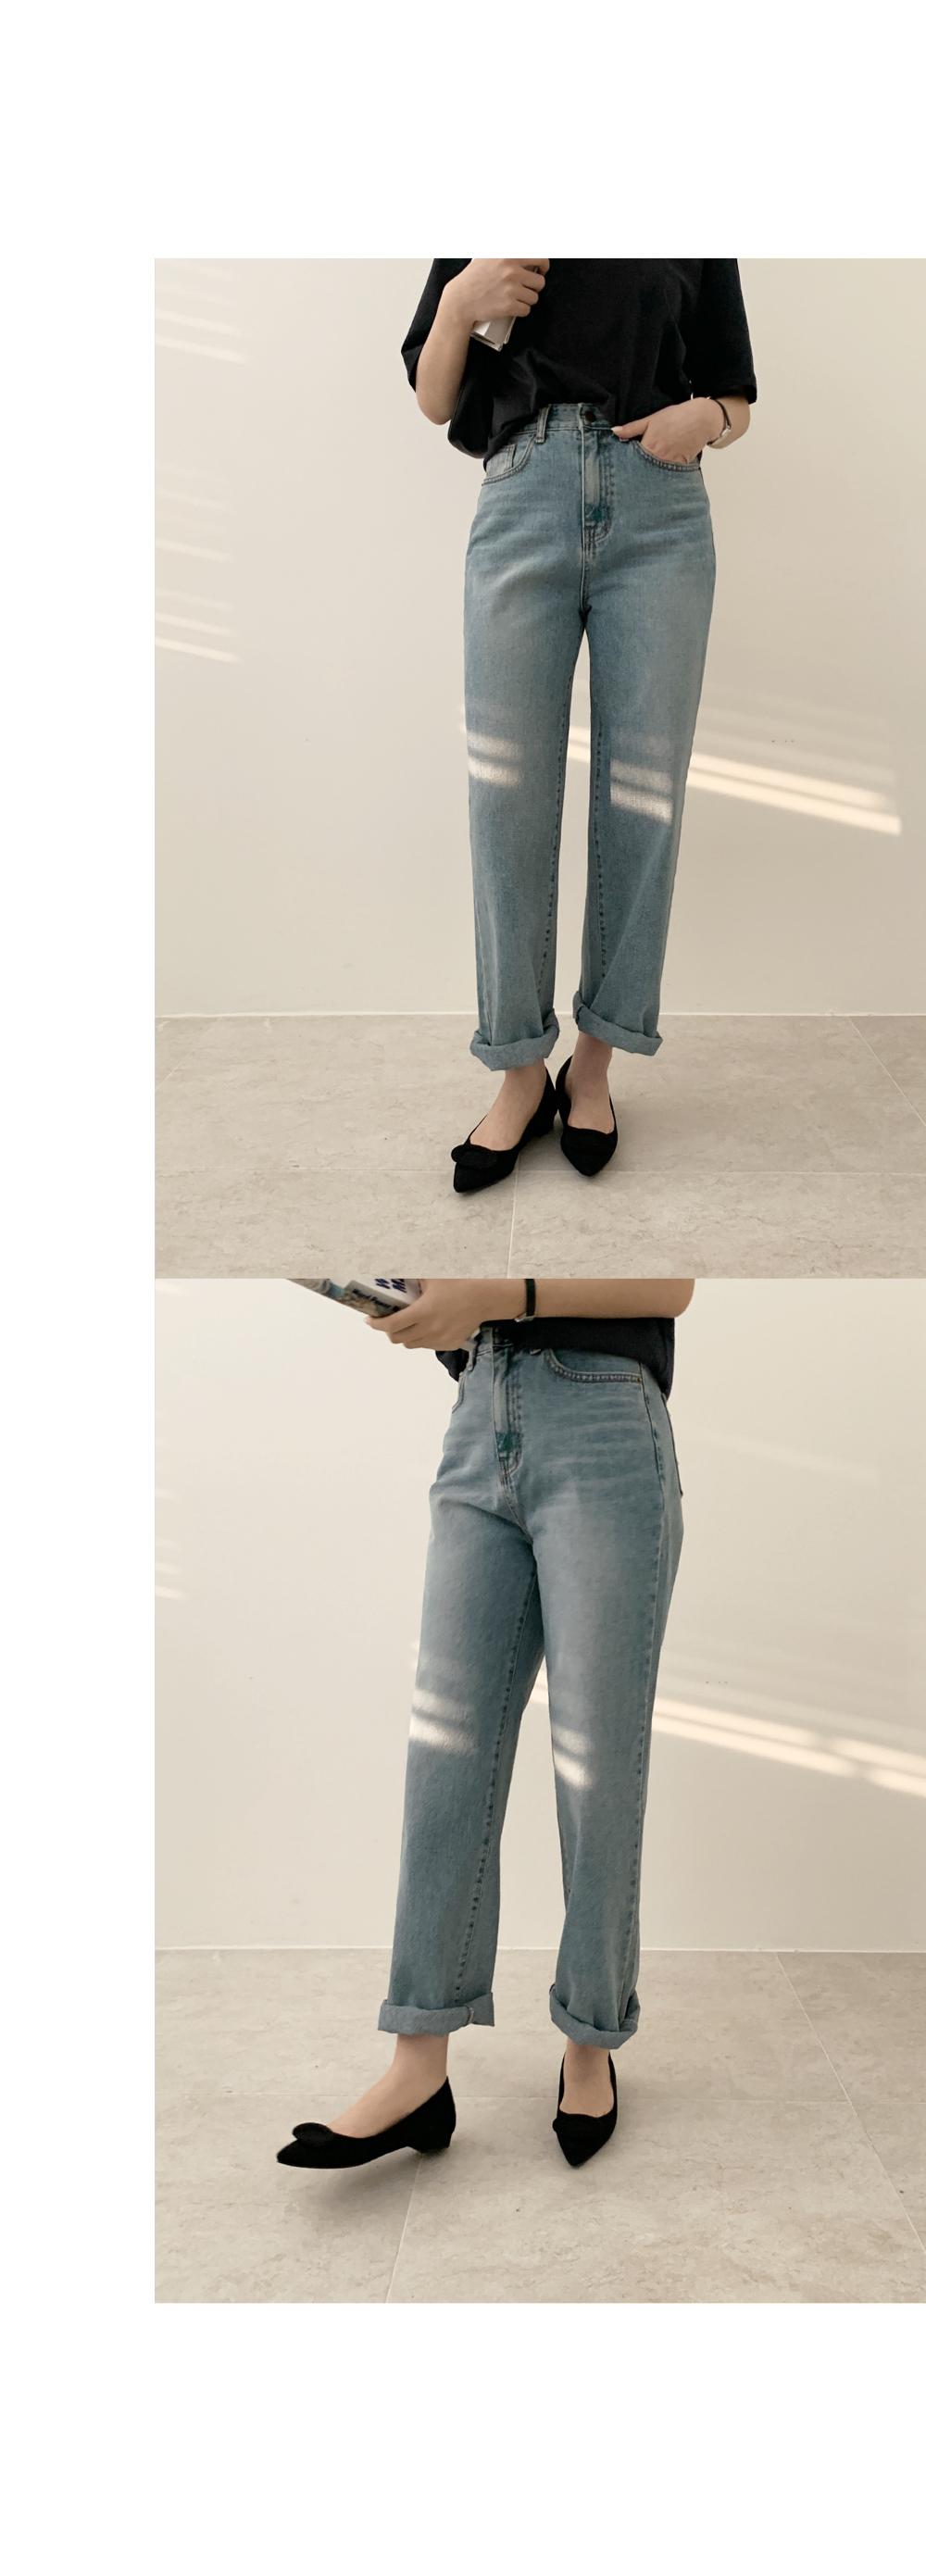 Maro flat shoes